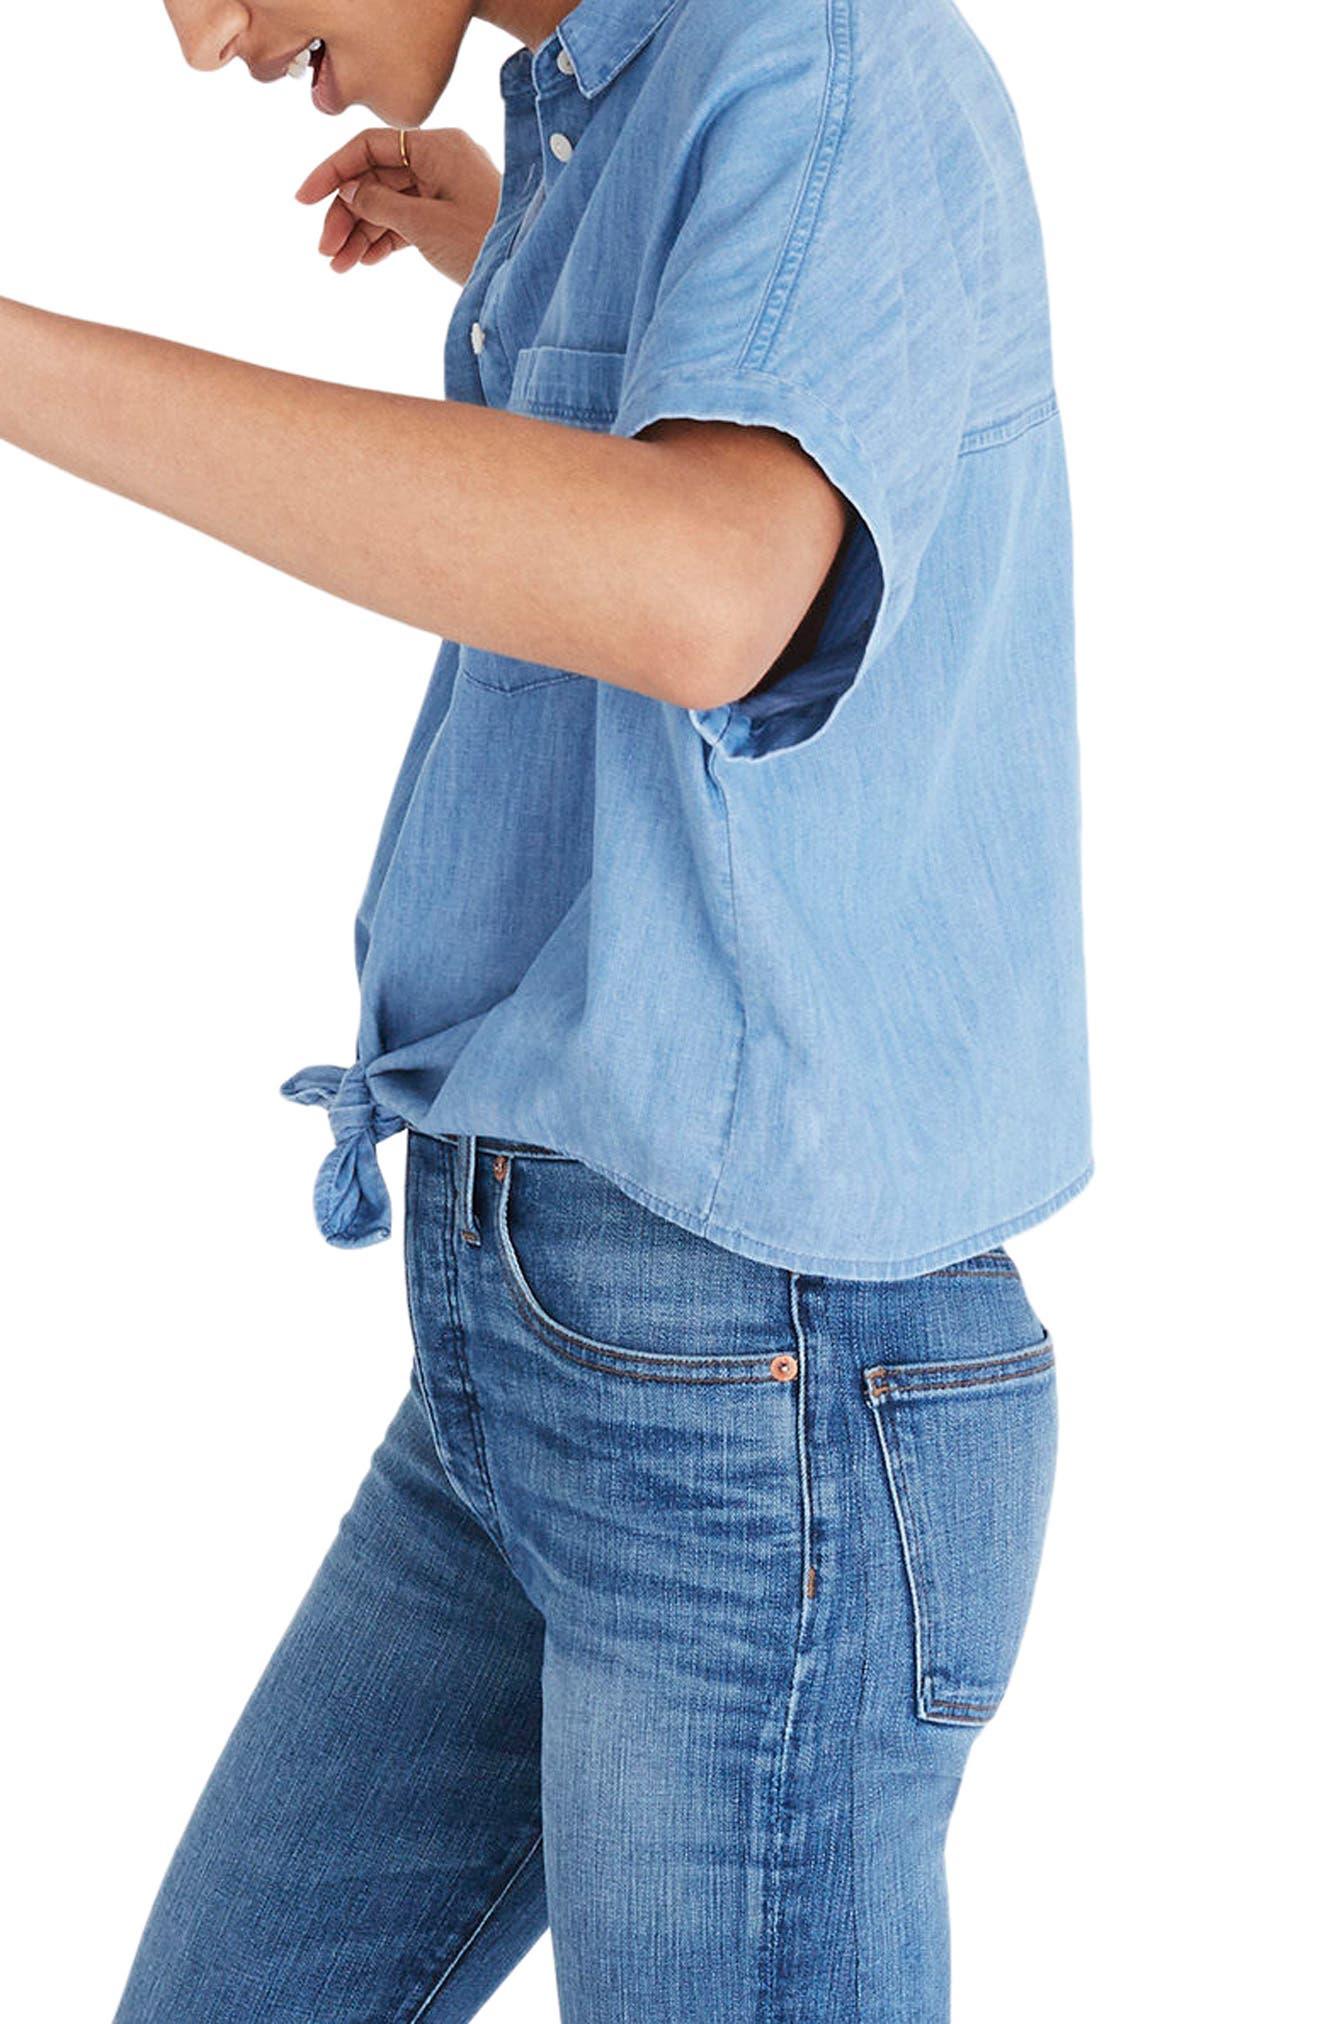 MADEWELL,                             Tie Front Short Sleeve Denim Shirt,                             Alternate thumbnail 3, color,                             400